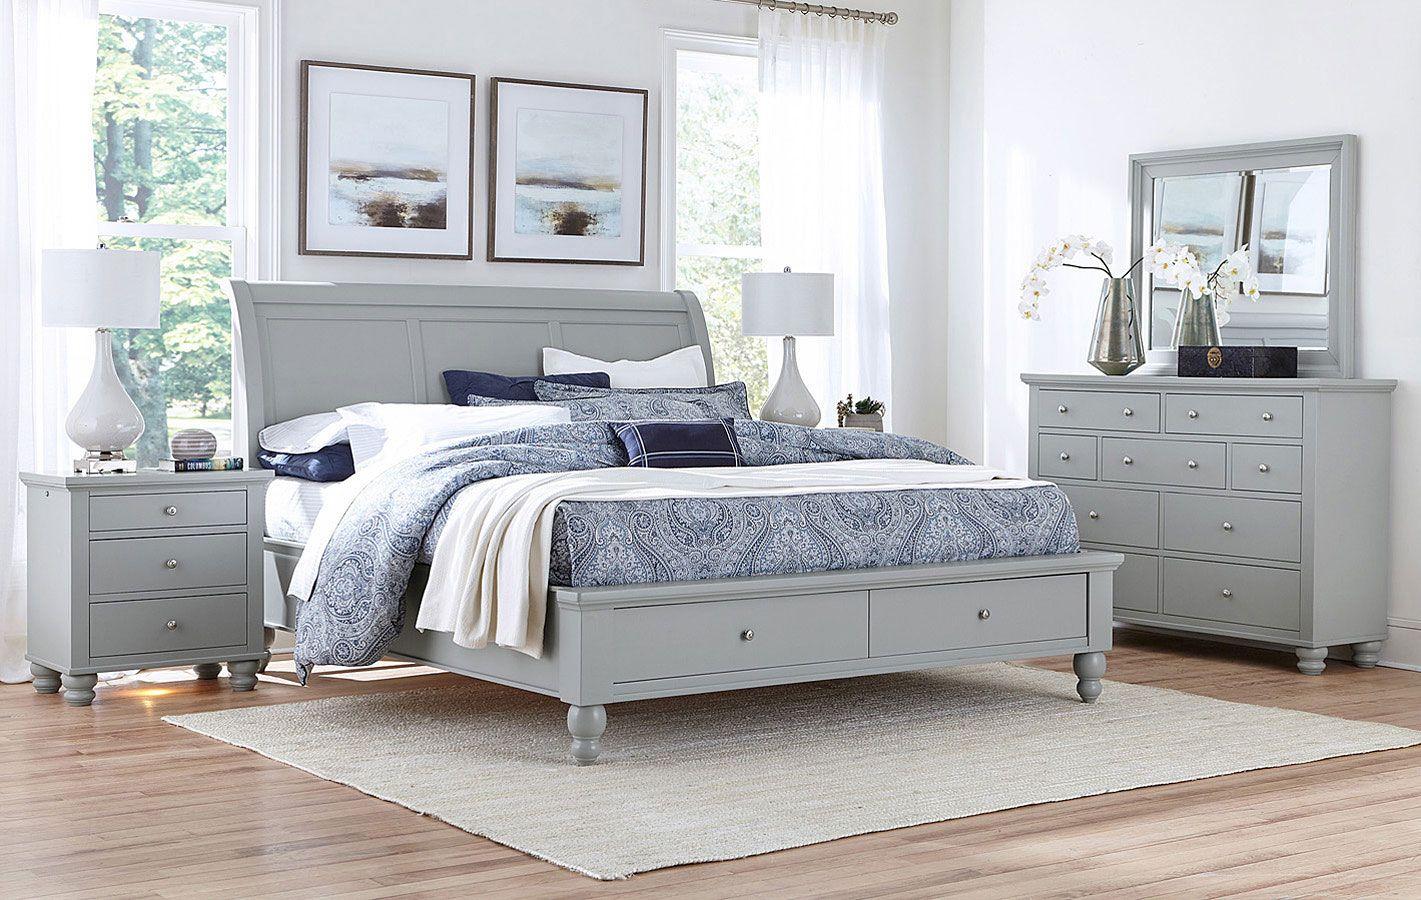 Cambridge Sleigh Storage Bedroom Set Light Gray Paint In 2020 Furniture King Storage Bed